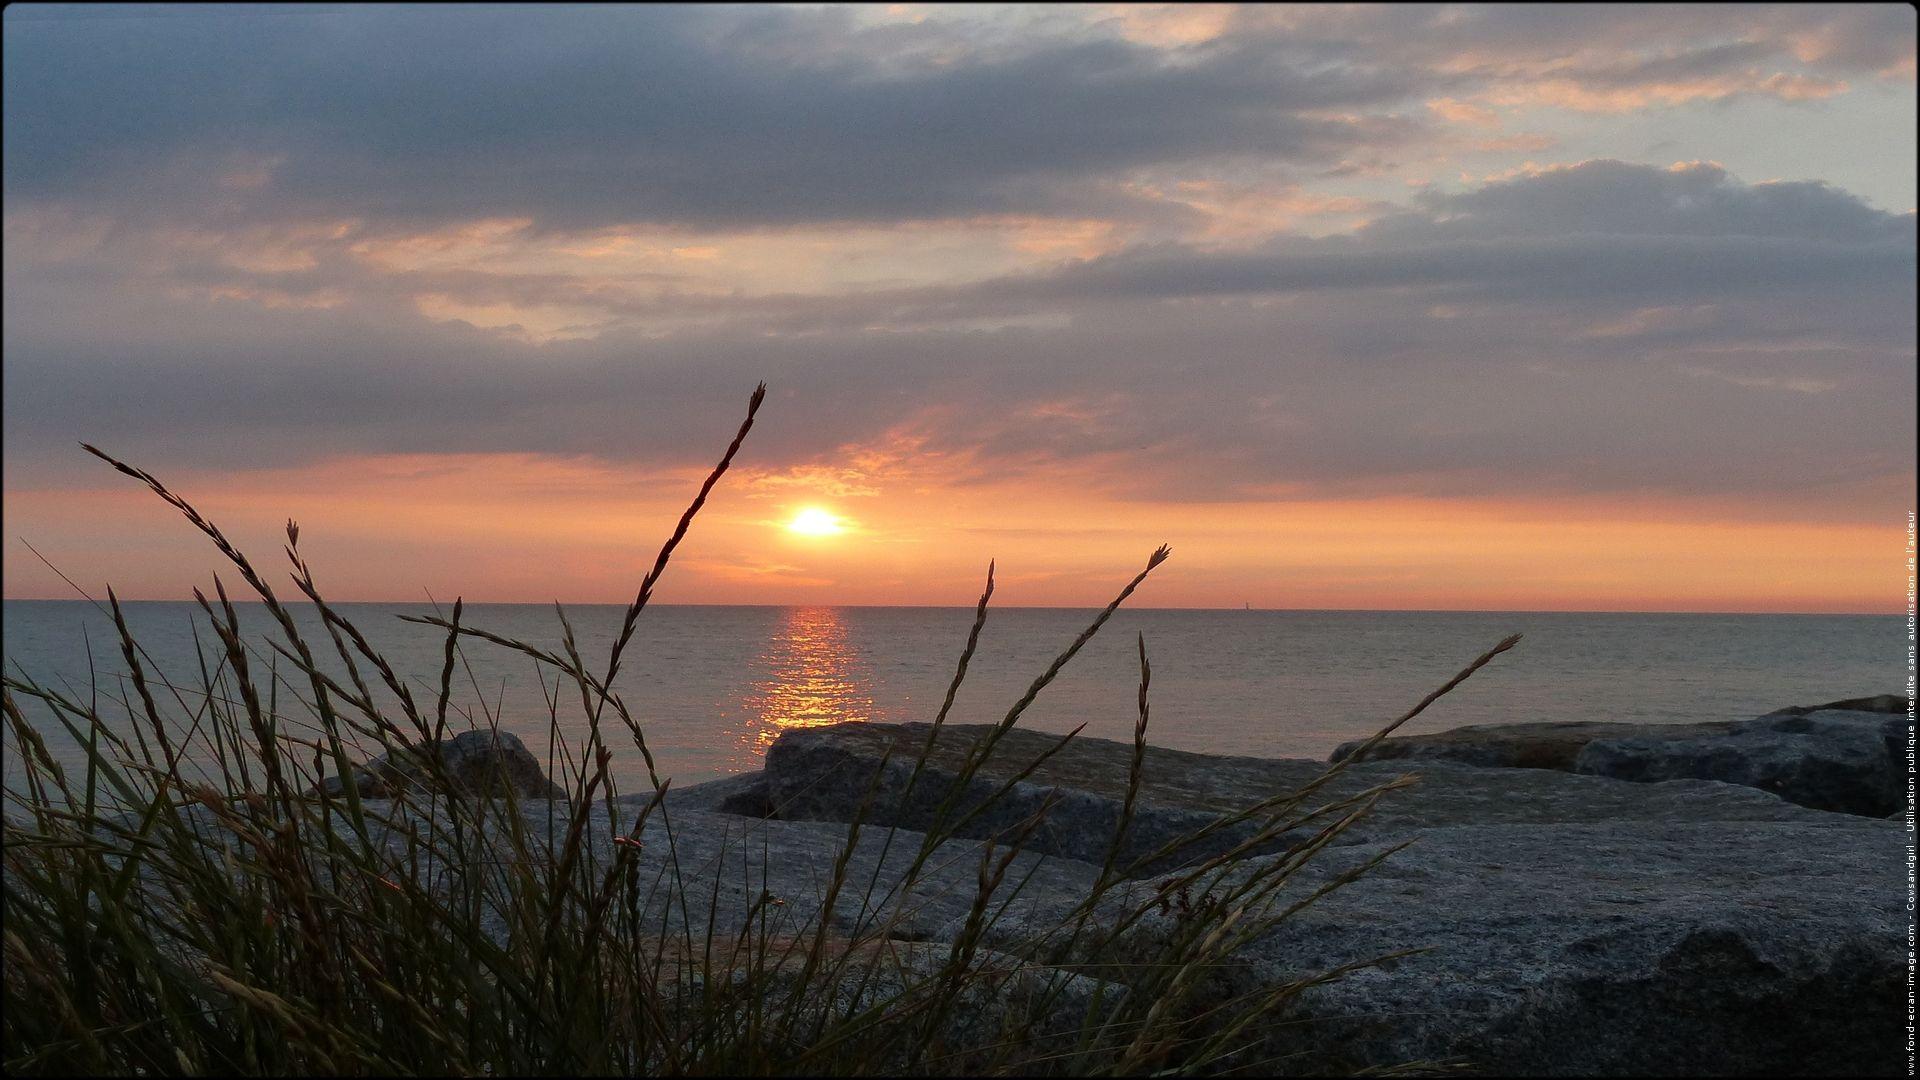 Sunshine Mer Sur Fei Coucher De Soleil Paysage Marin Mer Du Nord